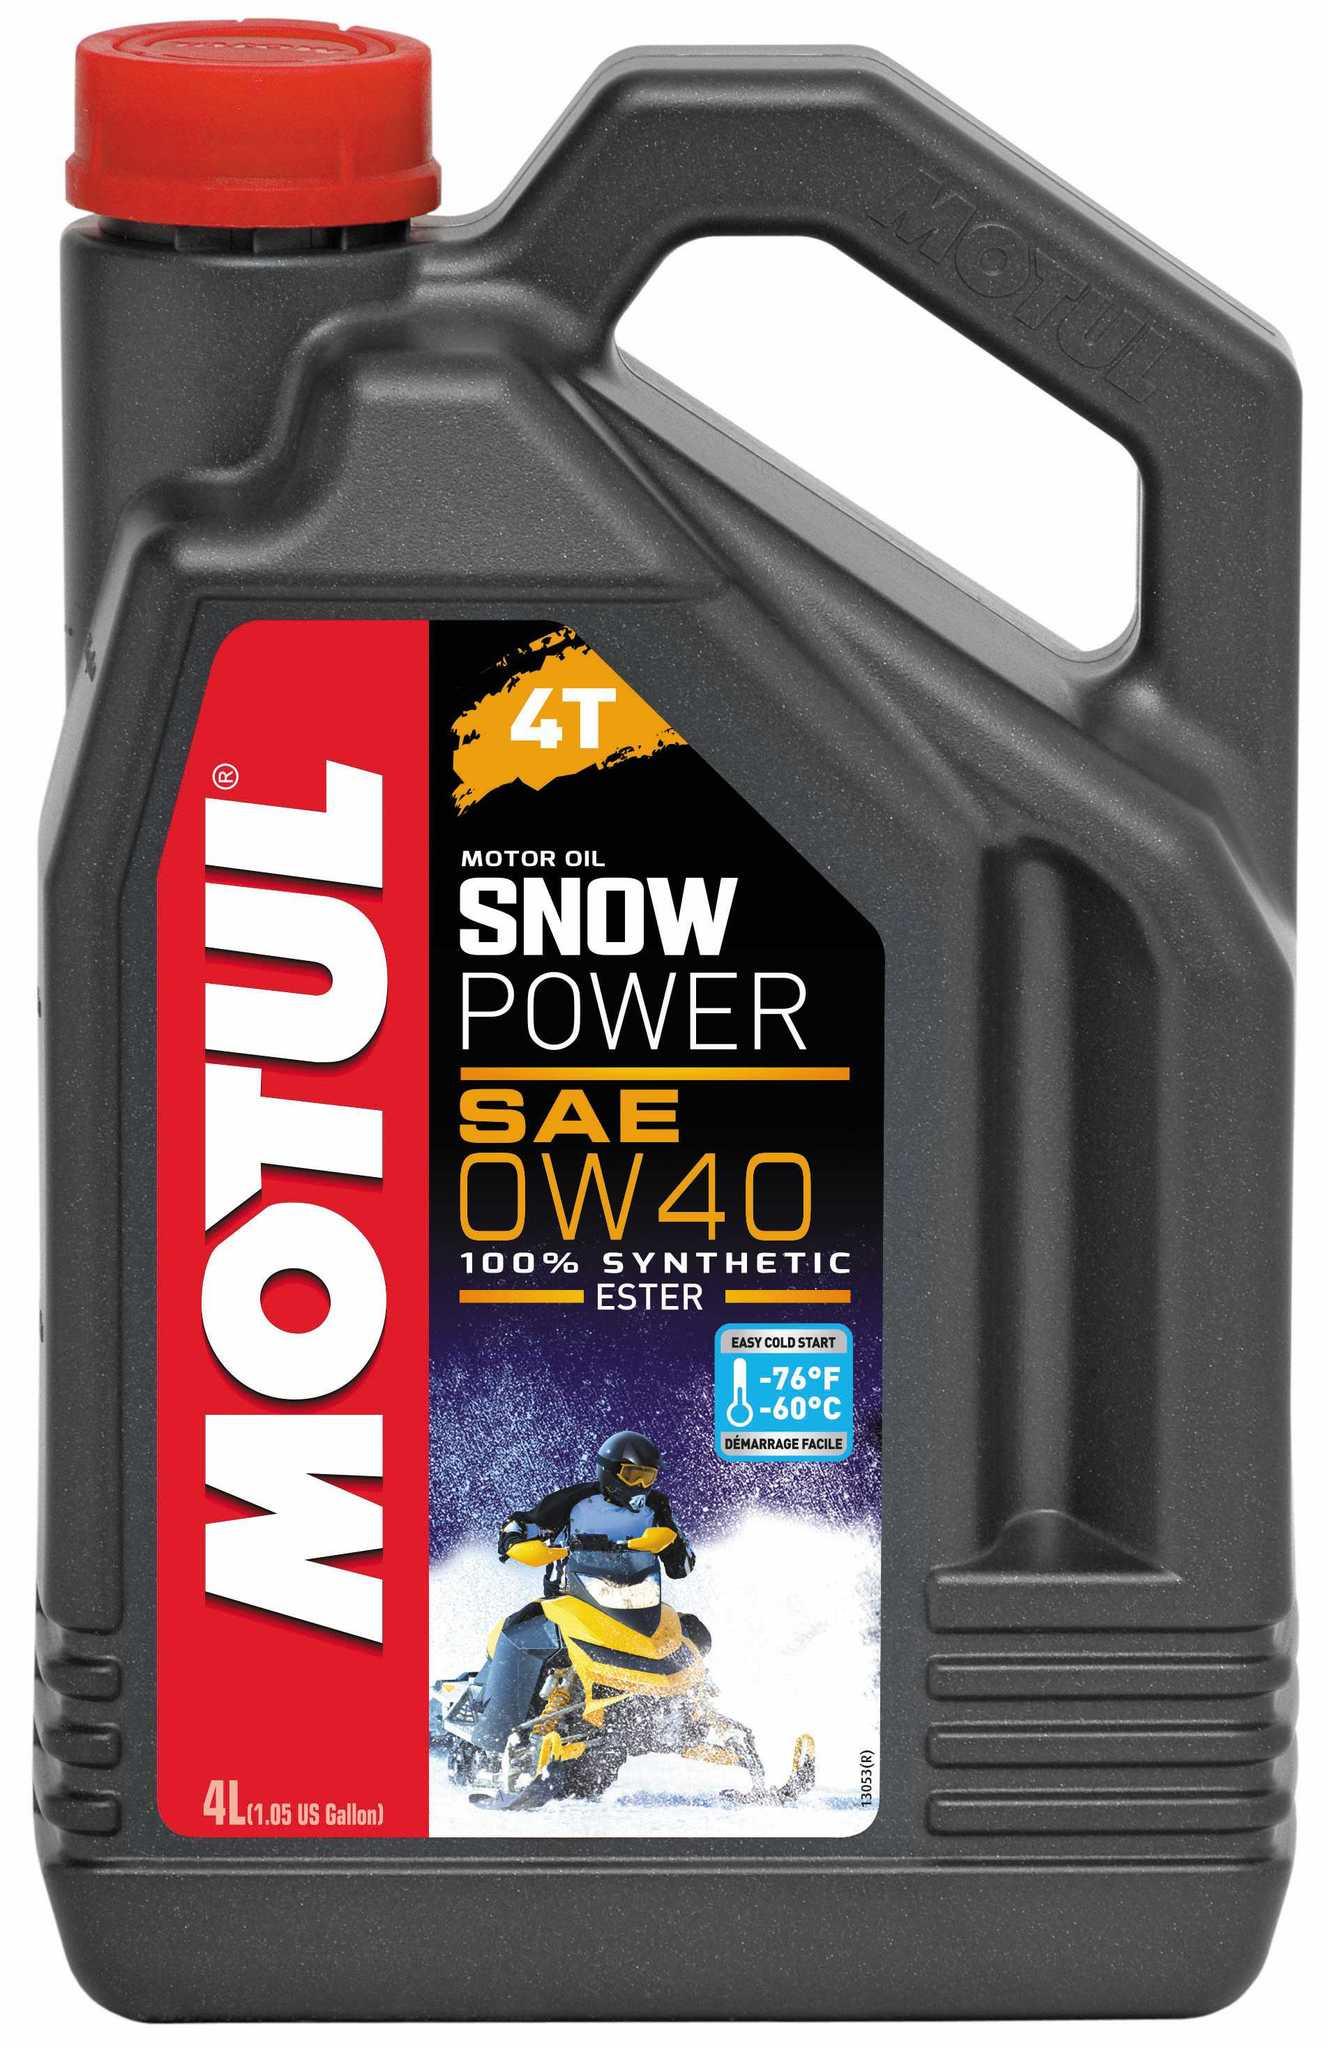 Motul Snowpower 4T 0w40  - Синтетическое масло для снегоходов